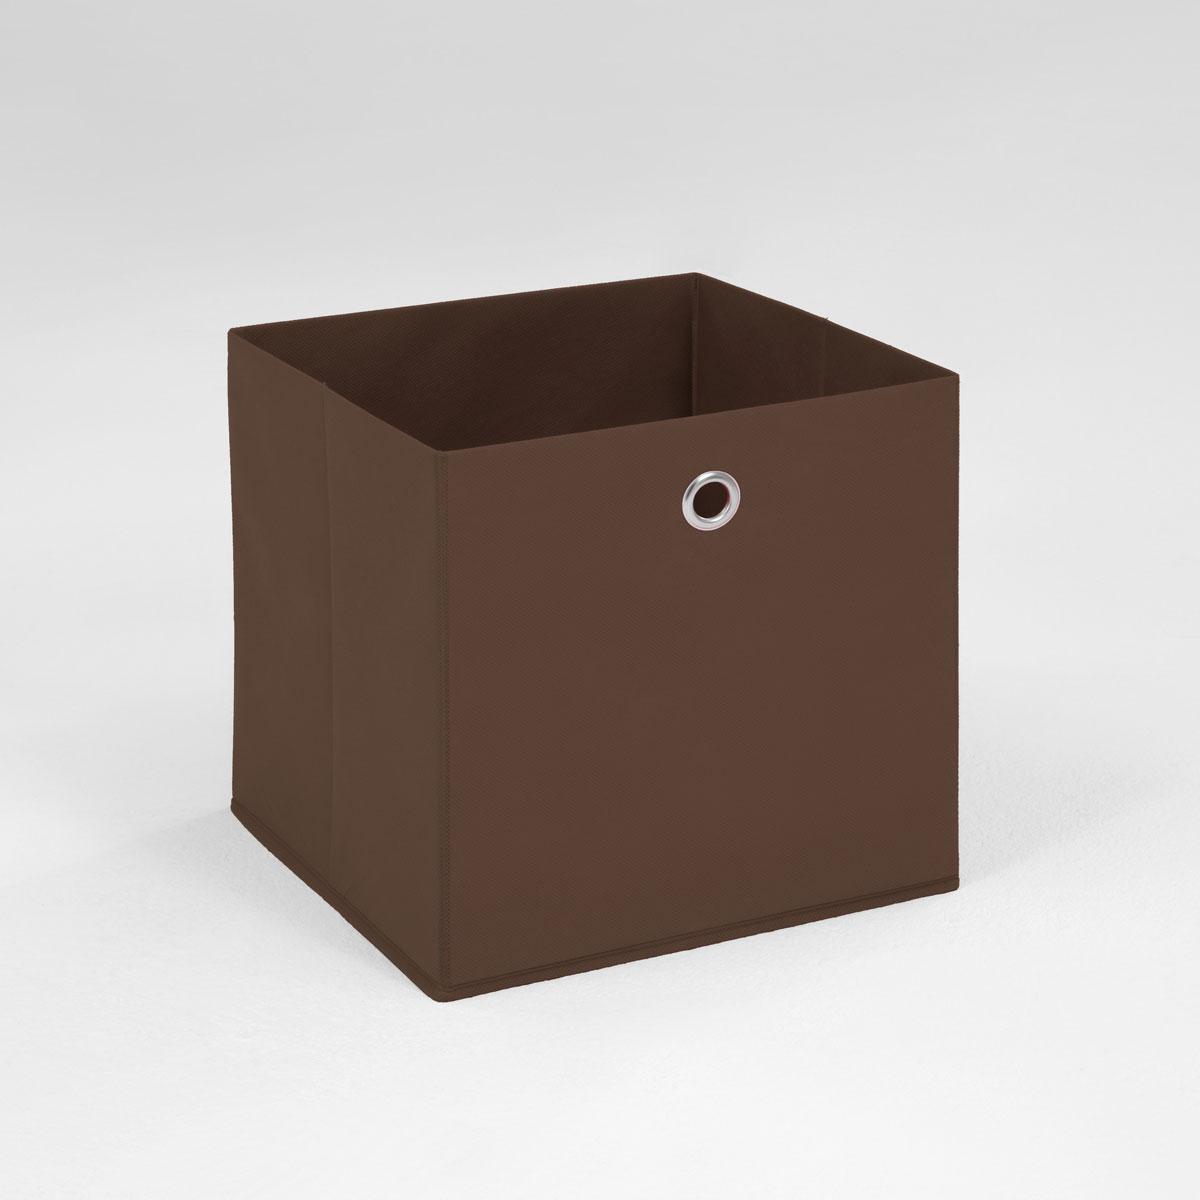 faltbox mega 3 in verschiedenen farben korb box regalkorb f r raumteiler ebay. Black Bedroom Furniture Sets. Home Design Ideas